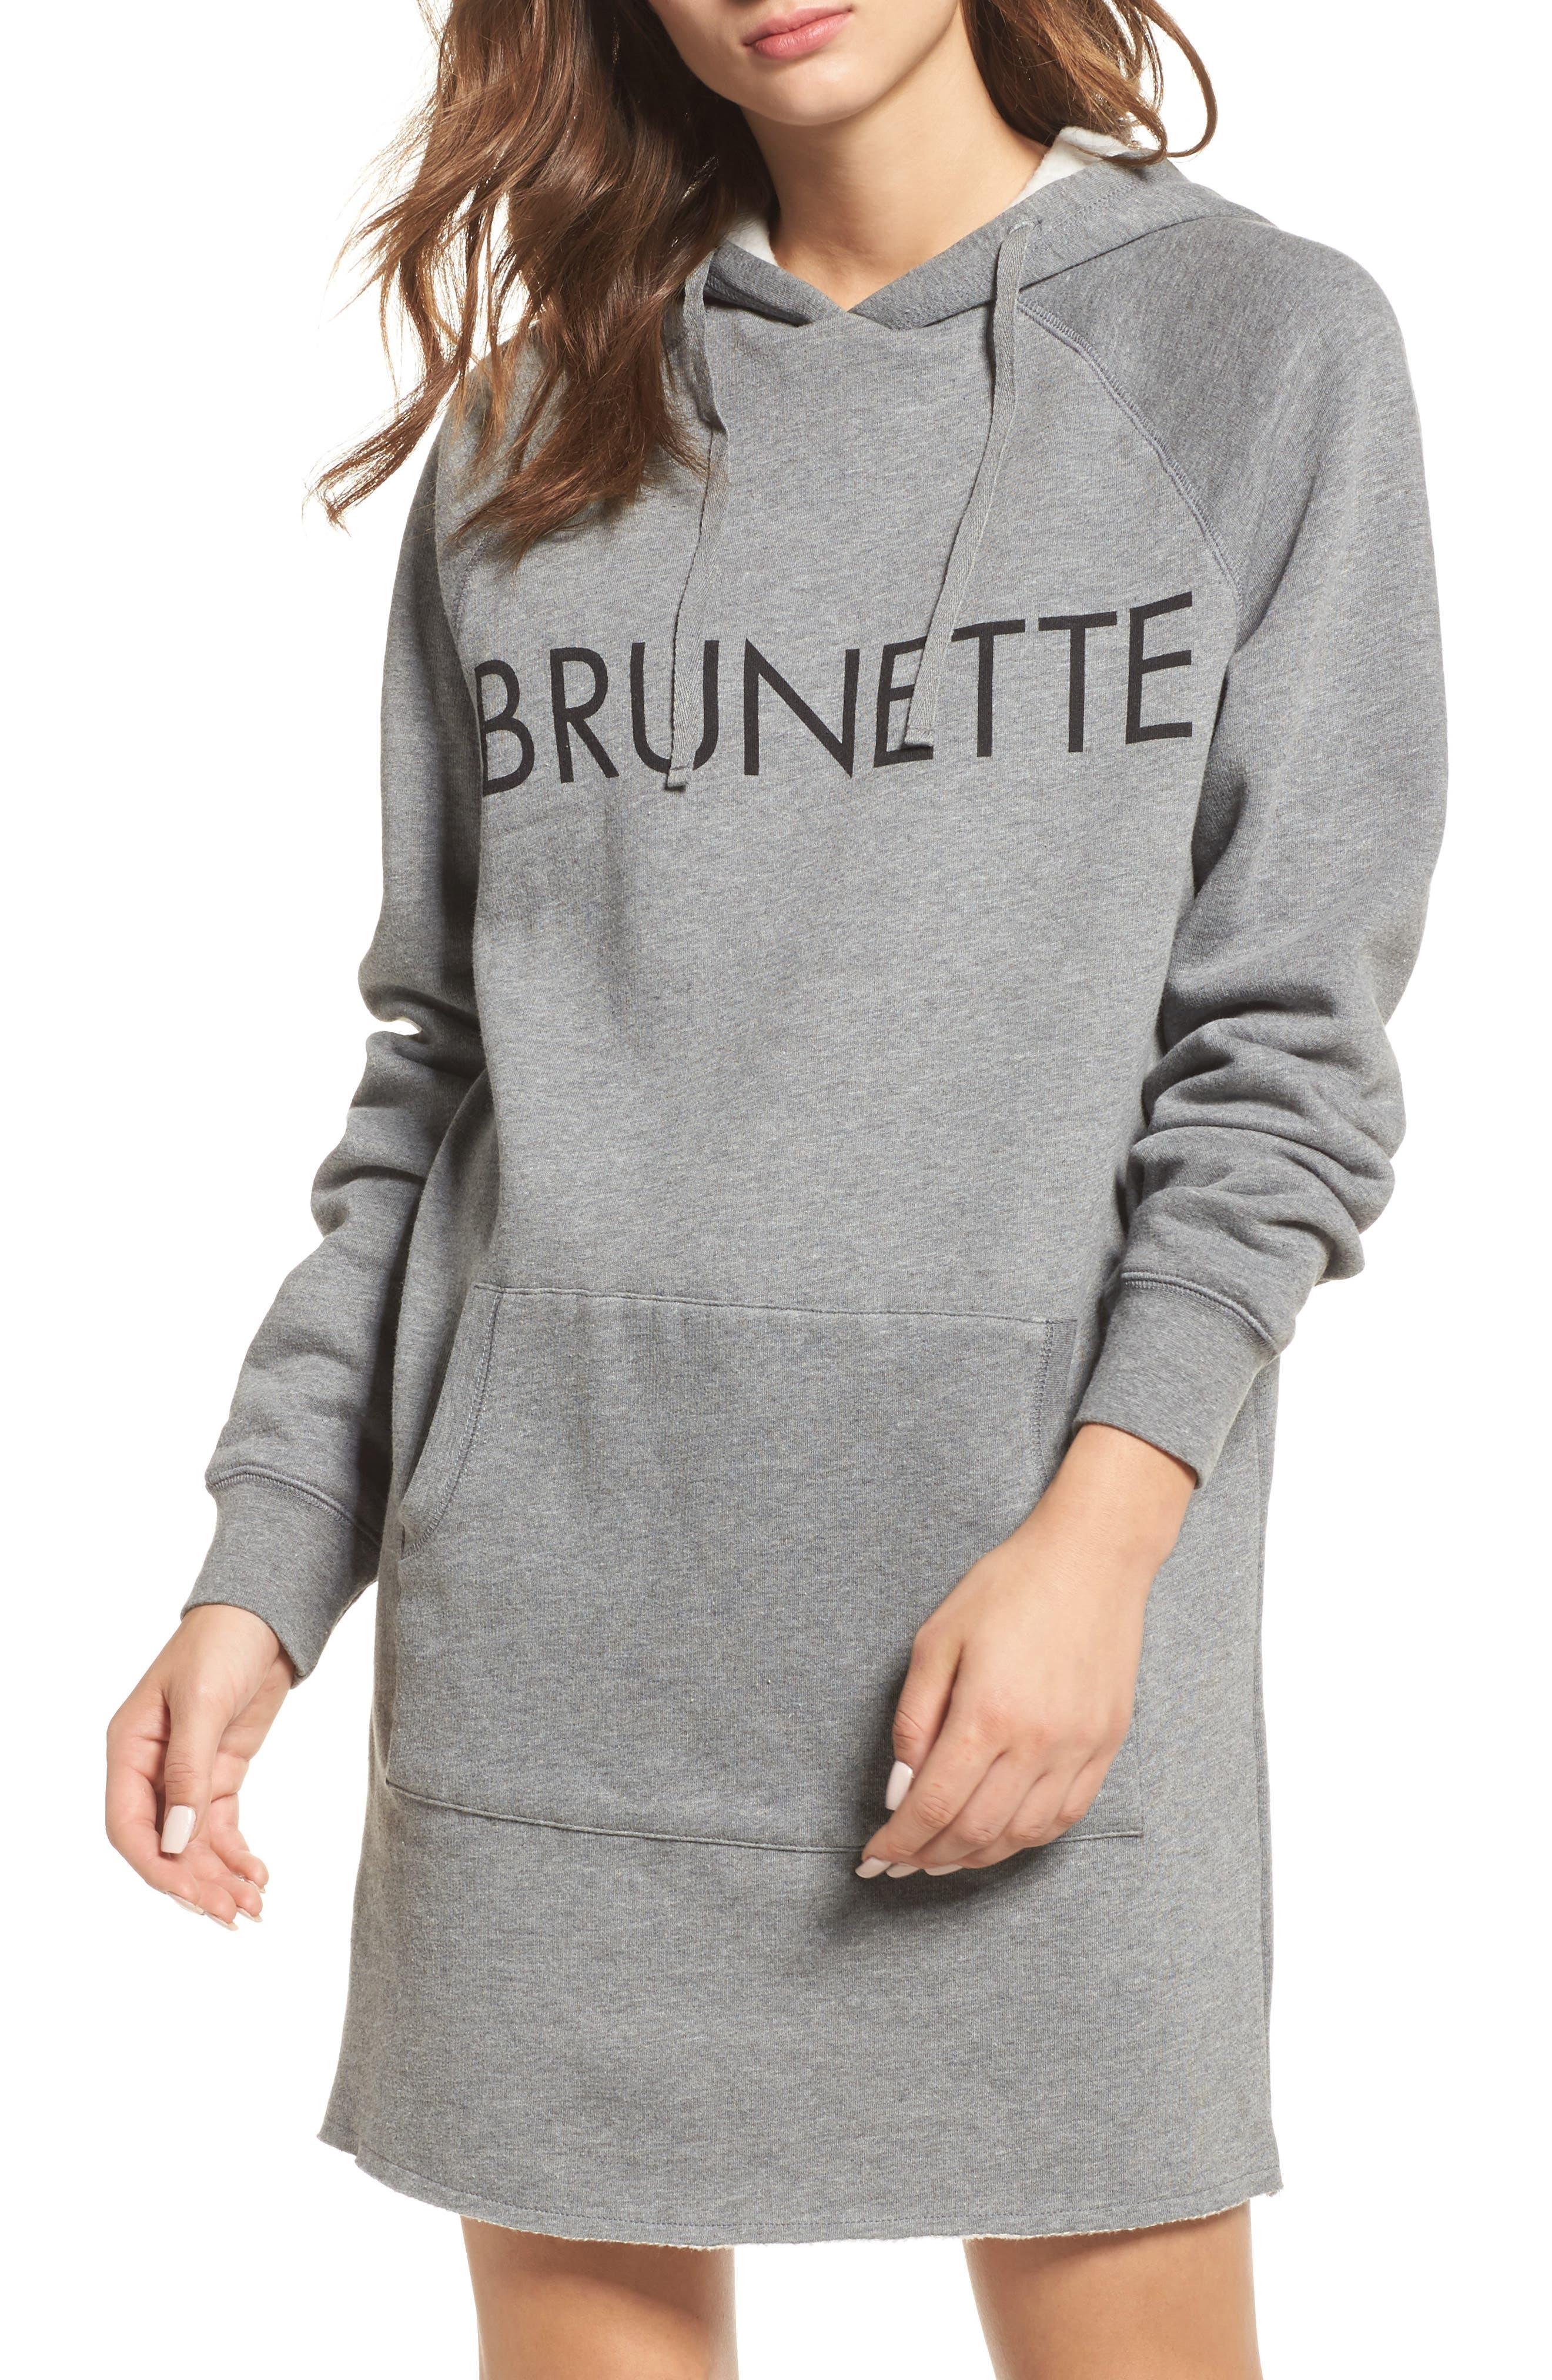 Brunette Sweatshirt Dress,                         Main,                         color, 020